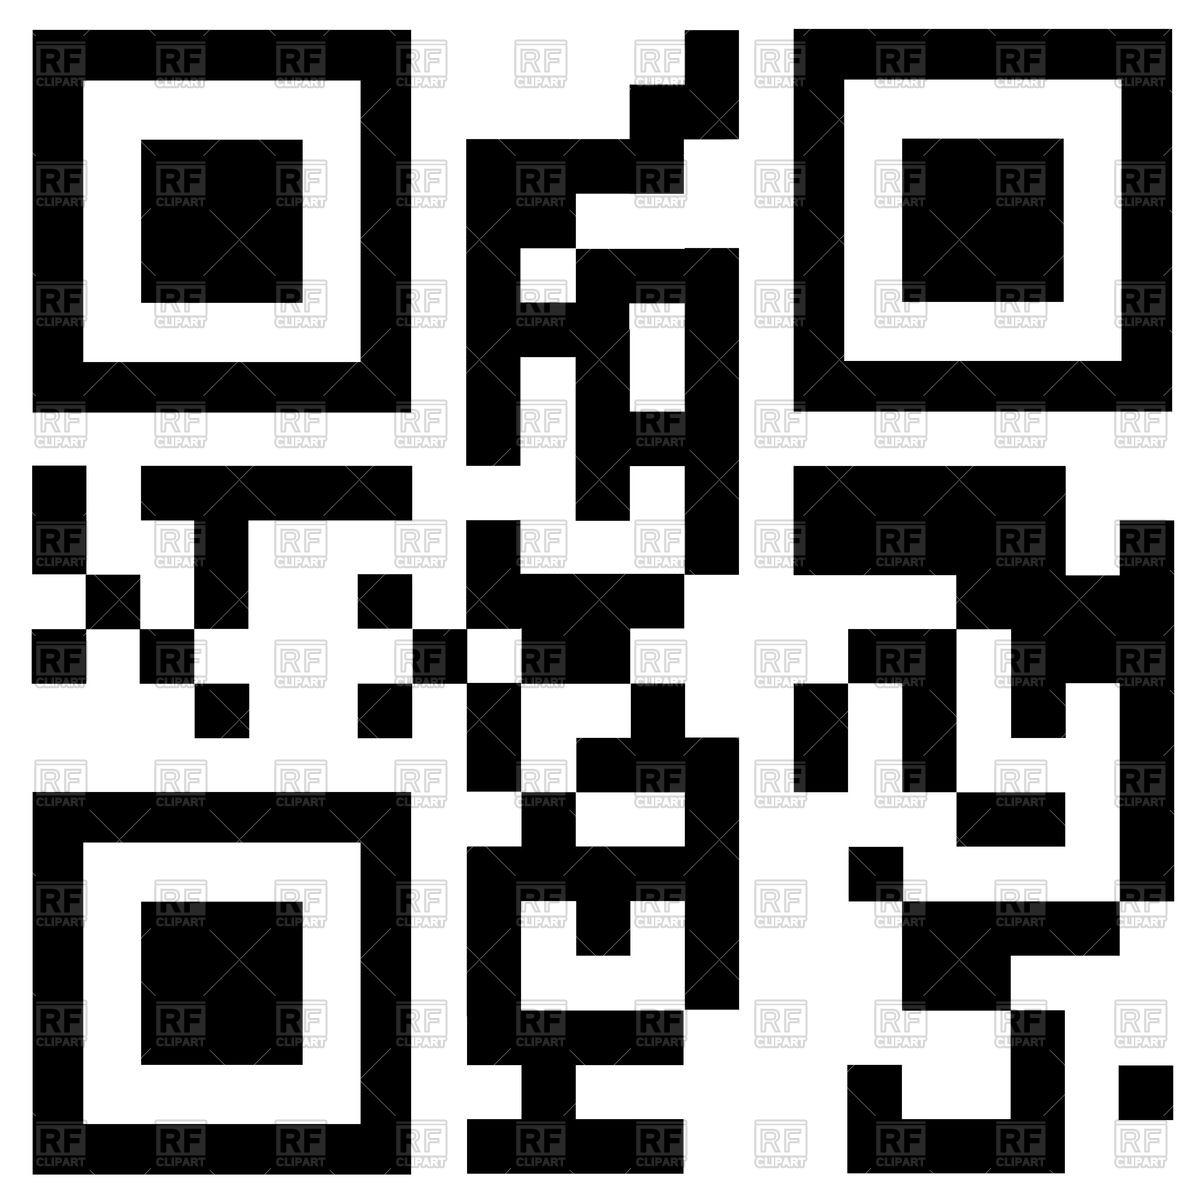 3D QR Code Vector Image #7035.